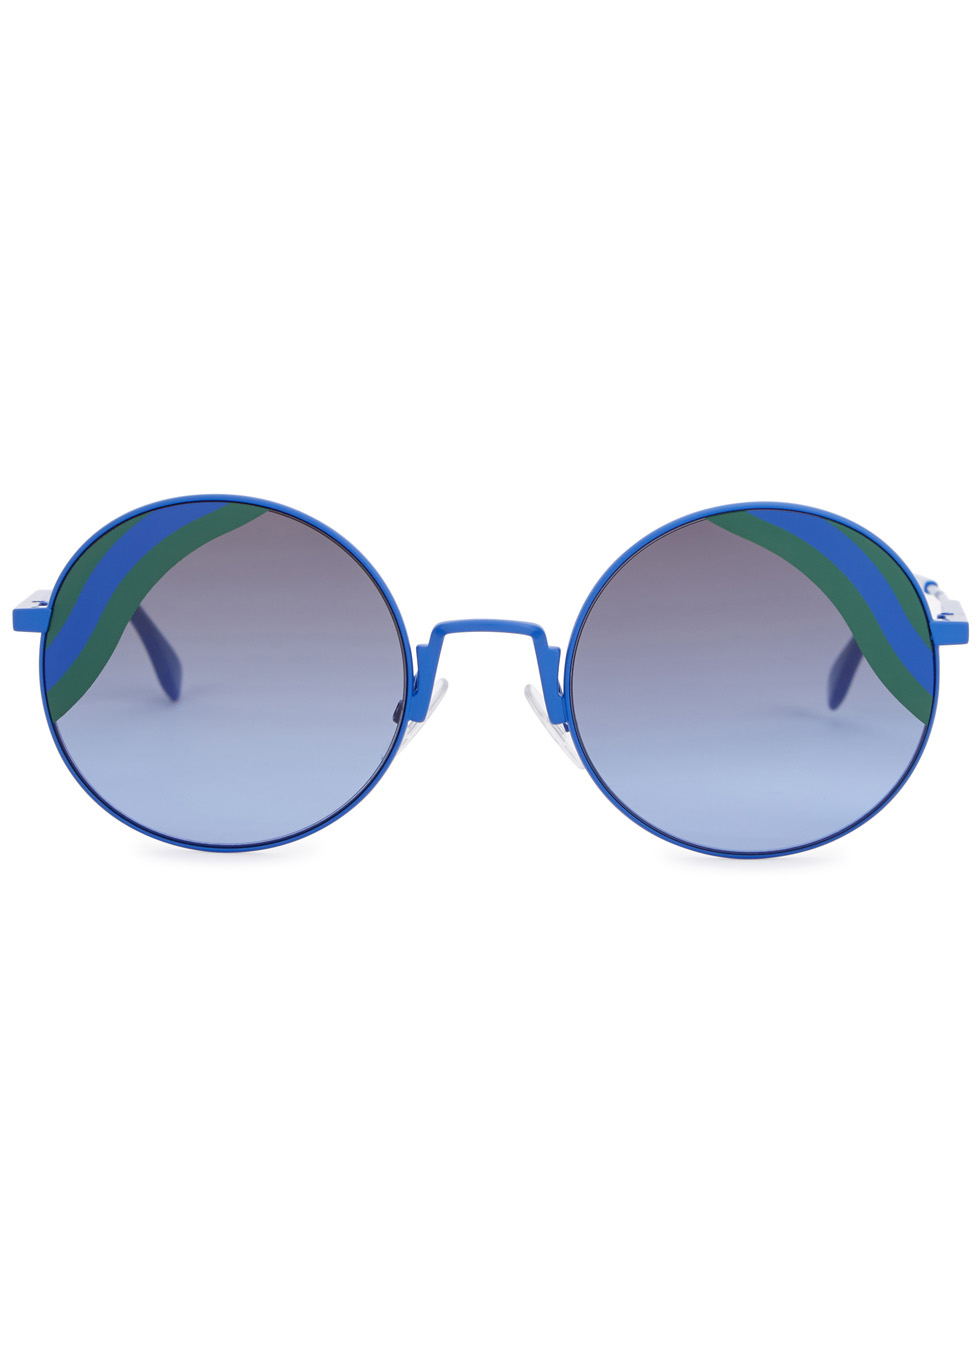 Waves blue round-frame sunglasses - Fendi